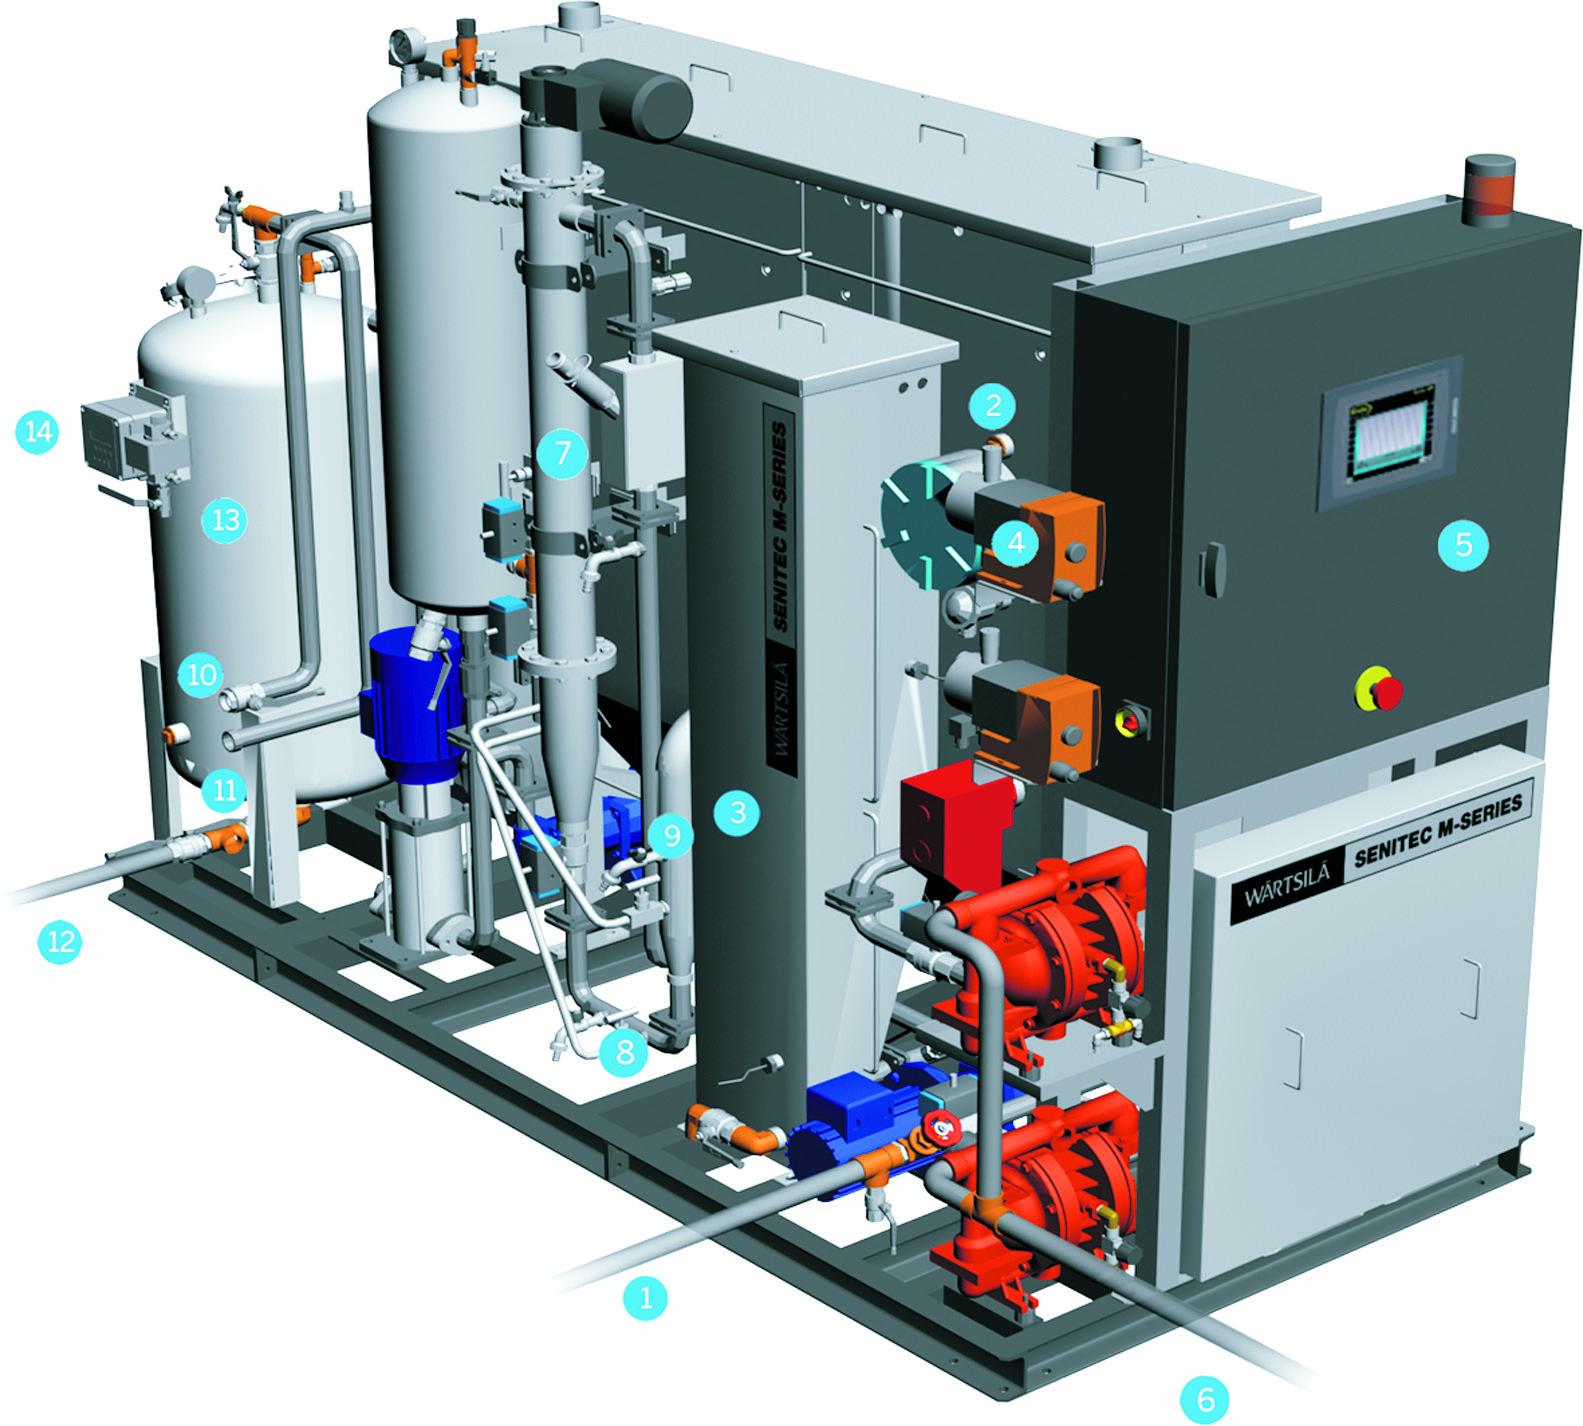 Oily water separator, bilge water separator